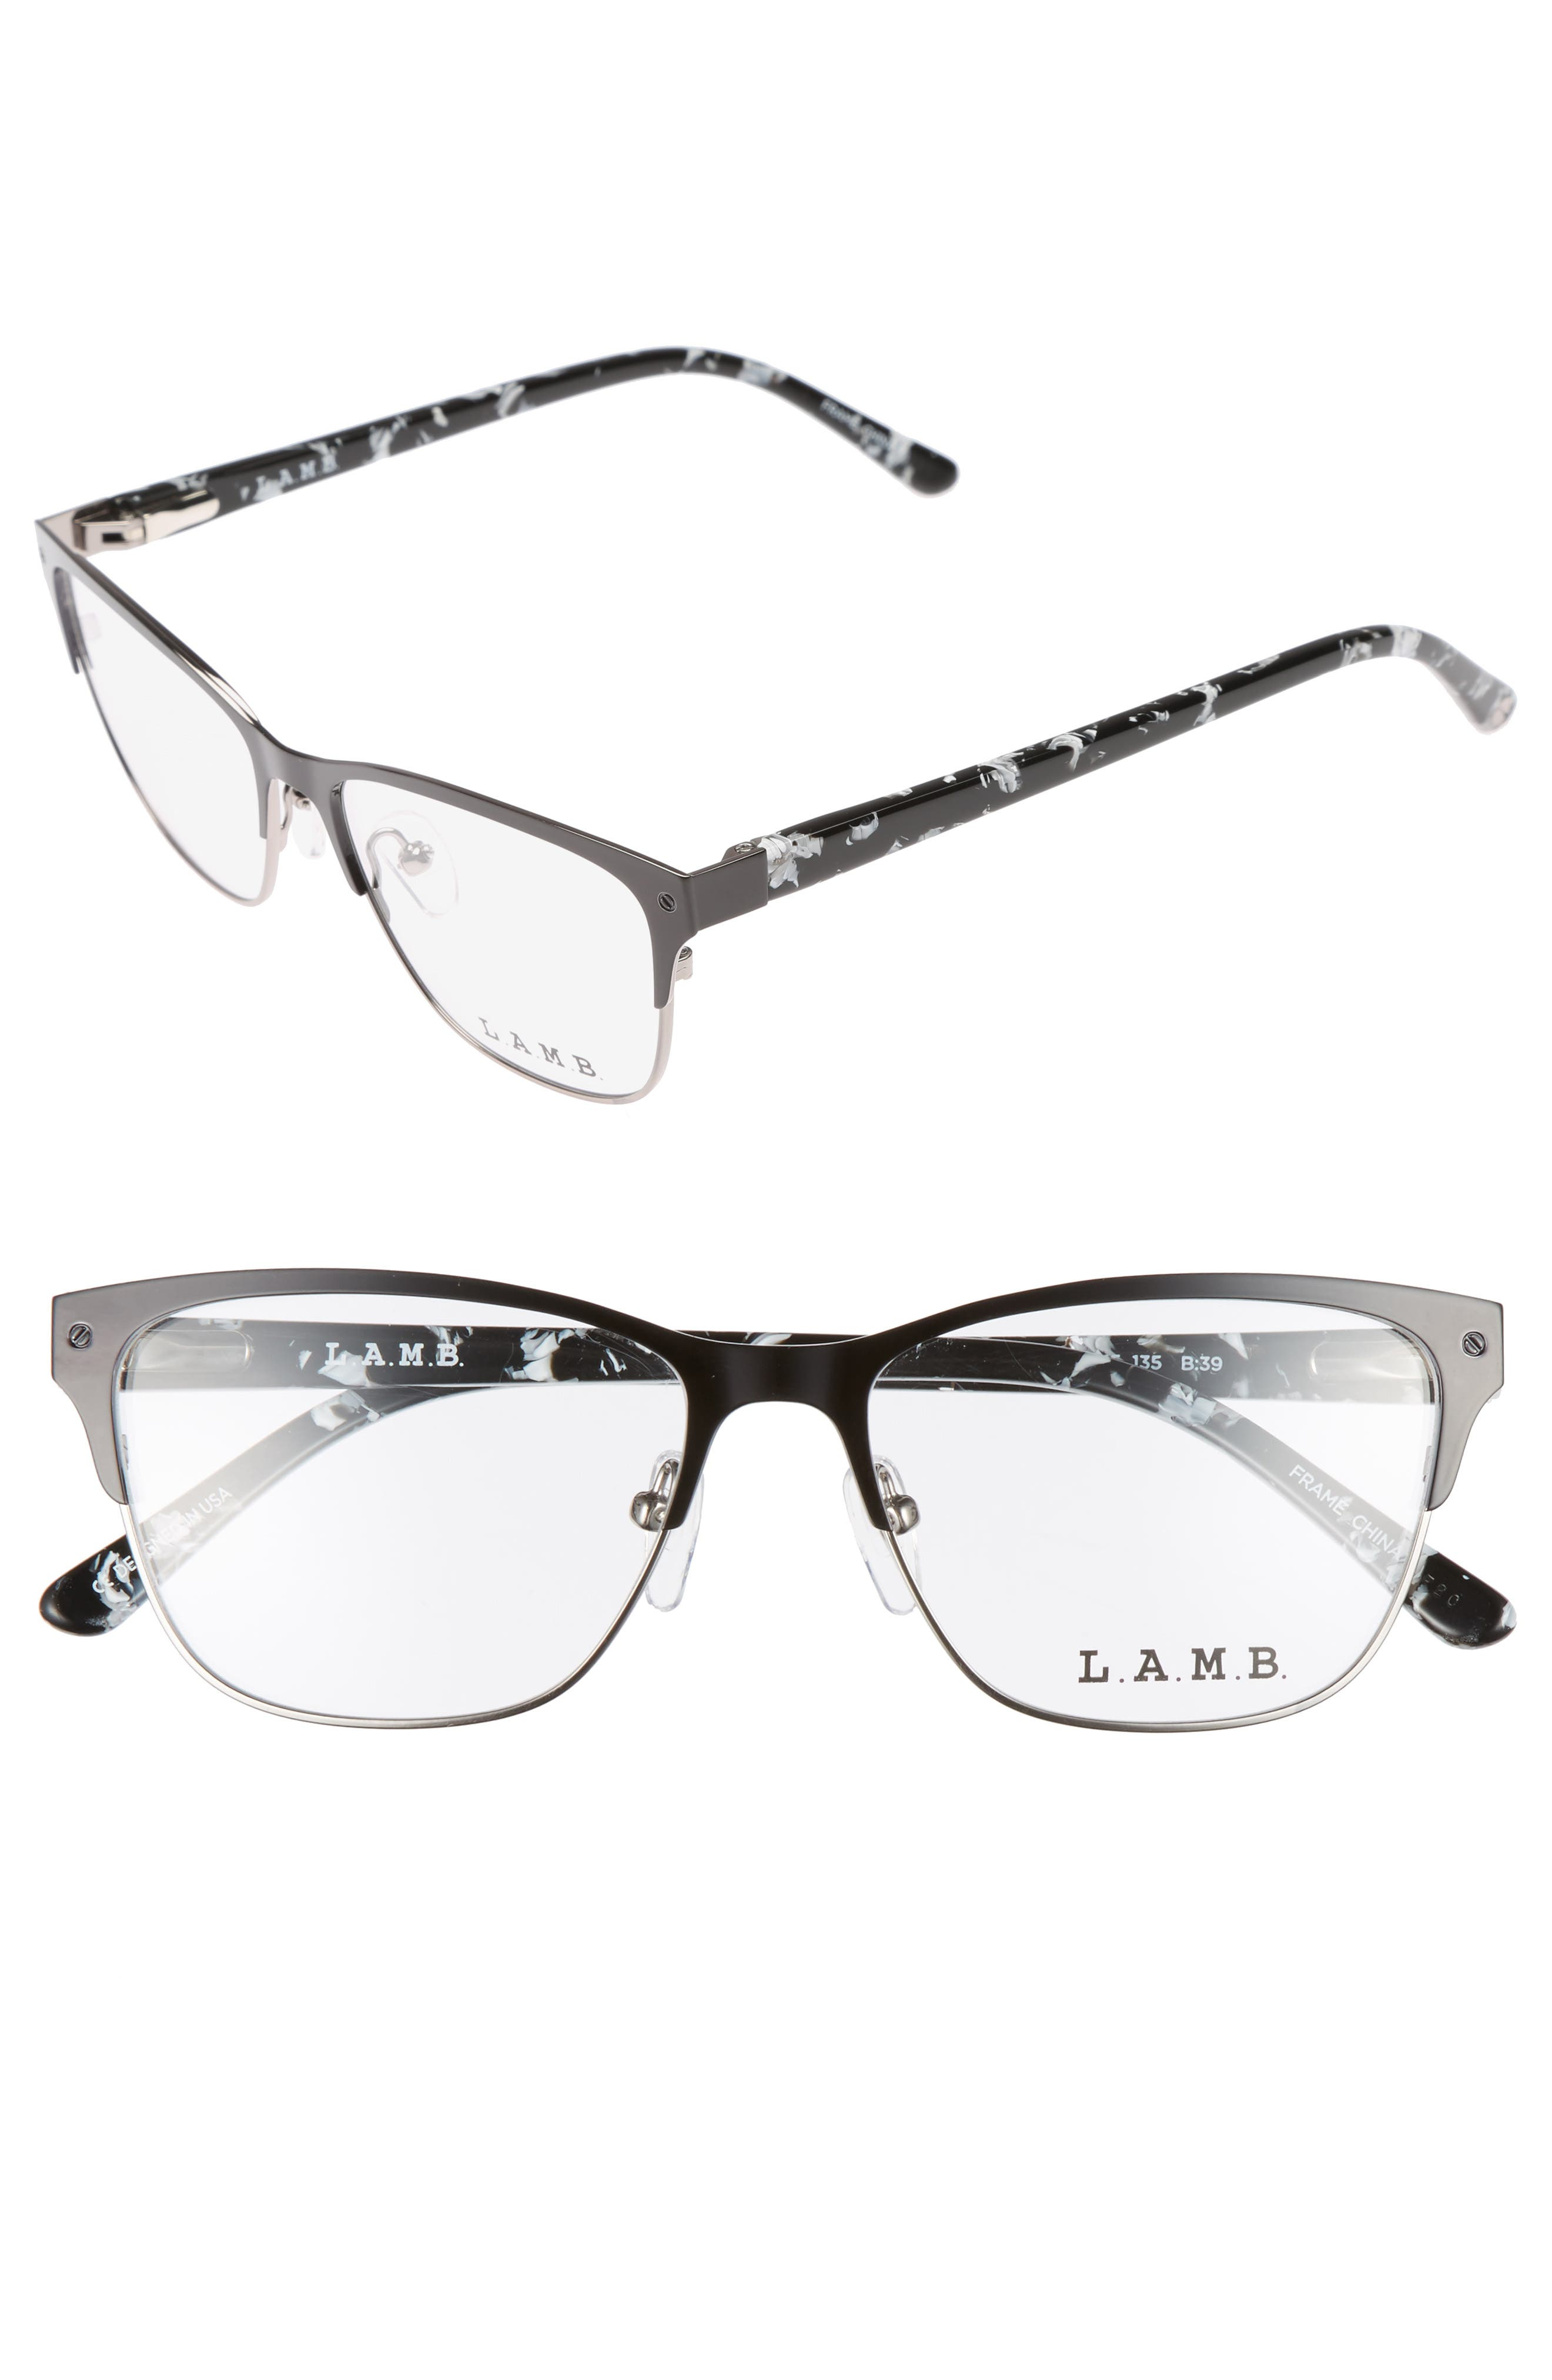 52mm Cat Eye Optical Glasses,                         Main,                         color,